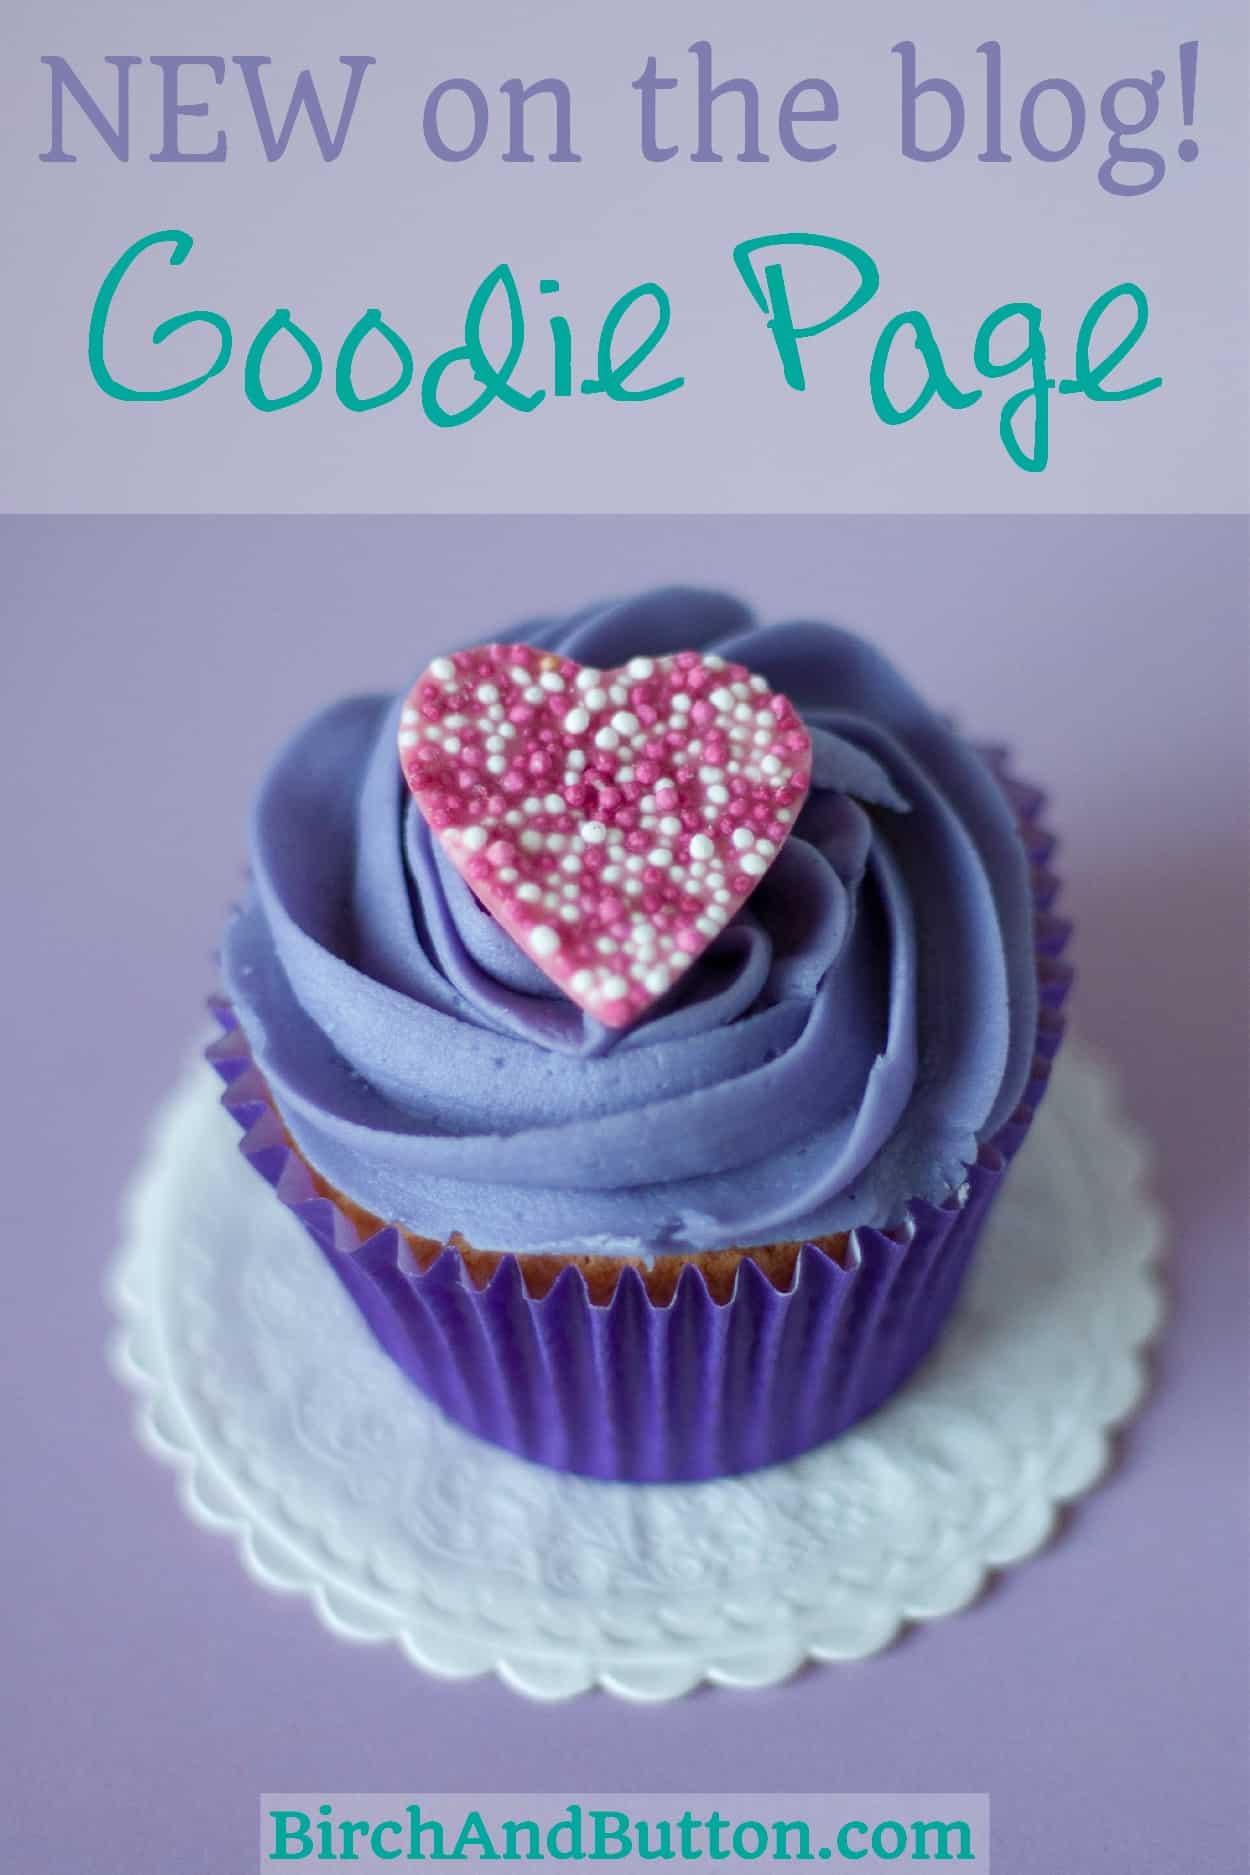 New Email Subscriber Goodie Page! | BirchAndButton.com